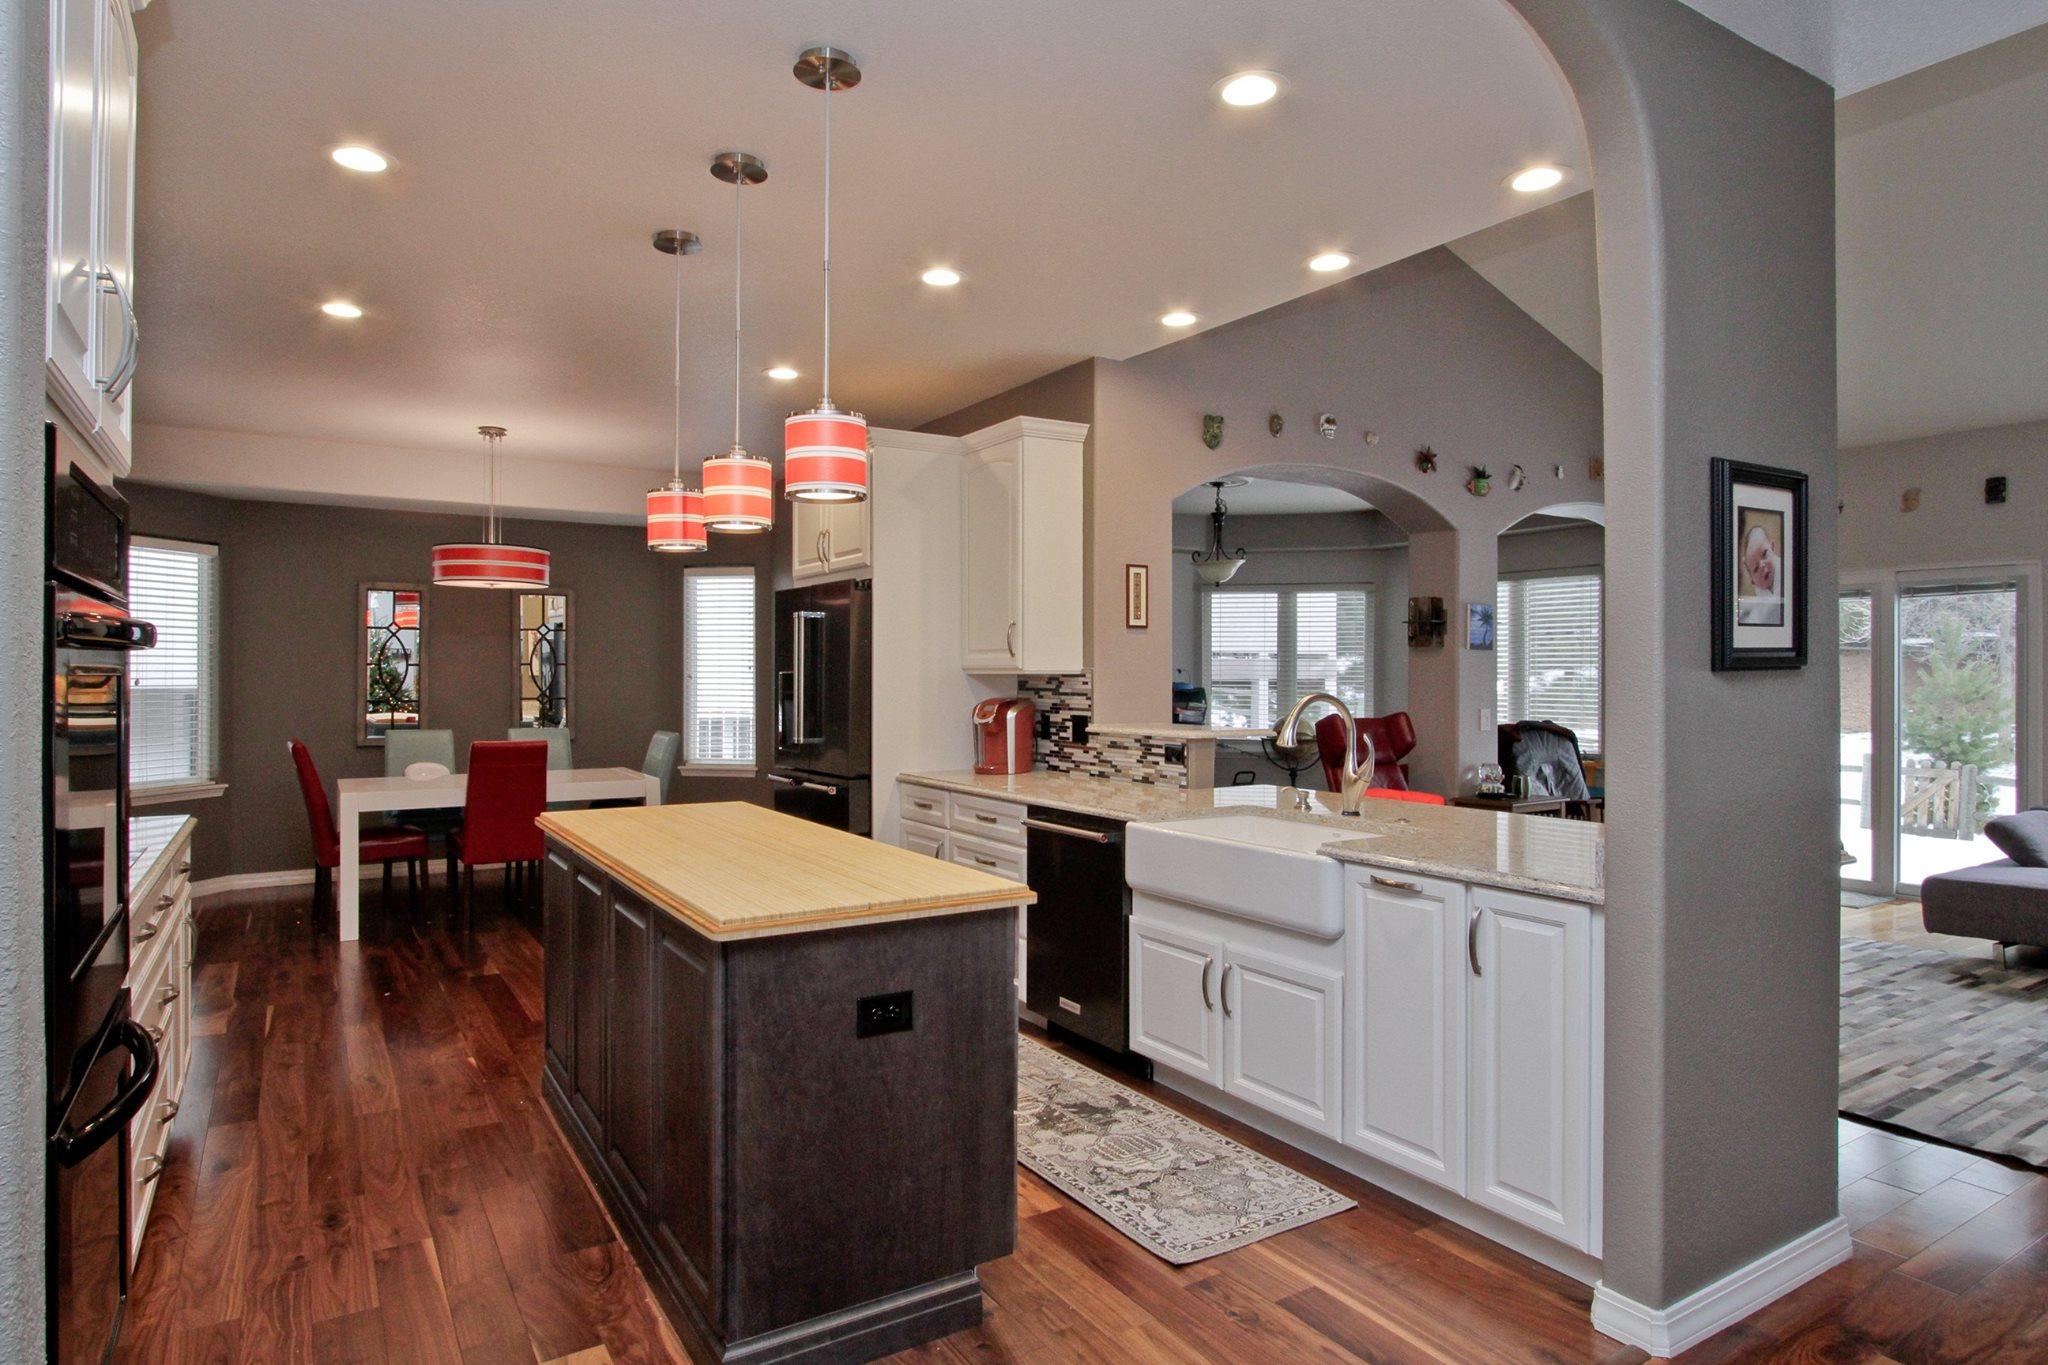 Kitchen, Bathroom, & Home Remodeling, Wheat Ridge, CO